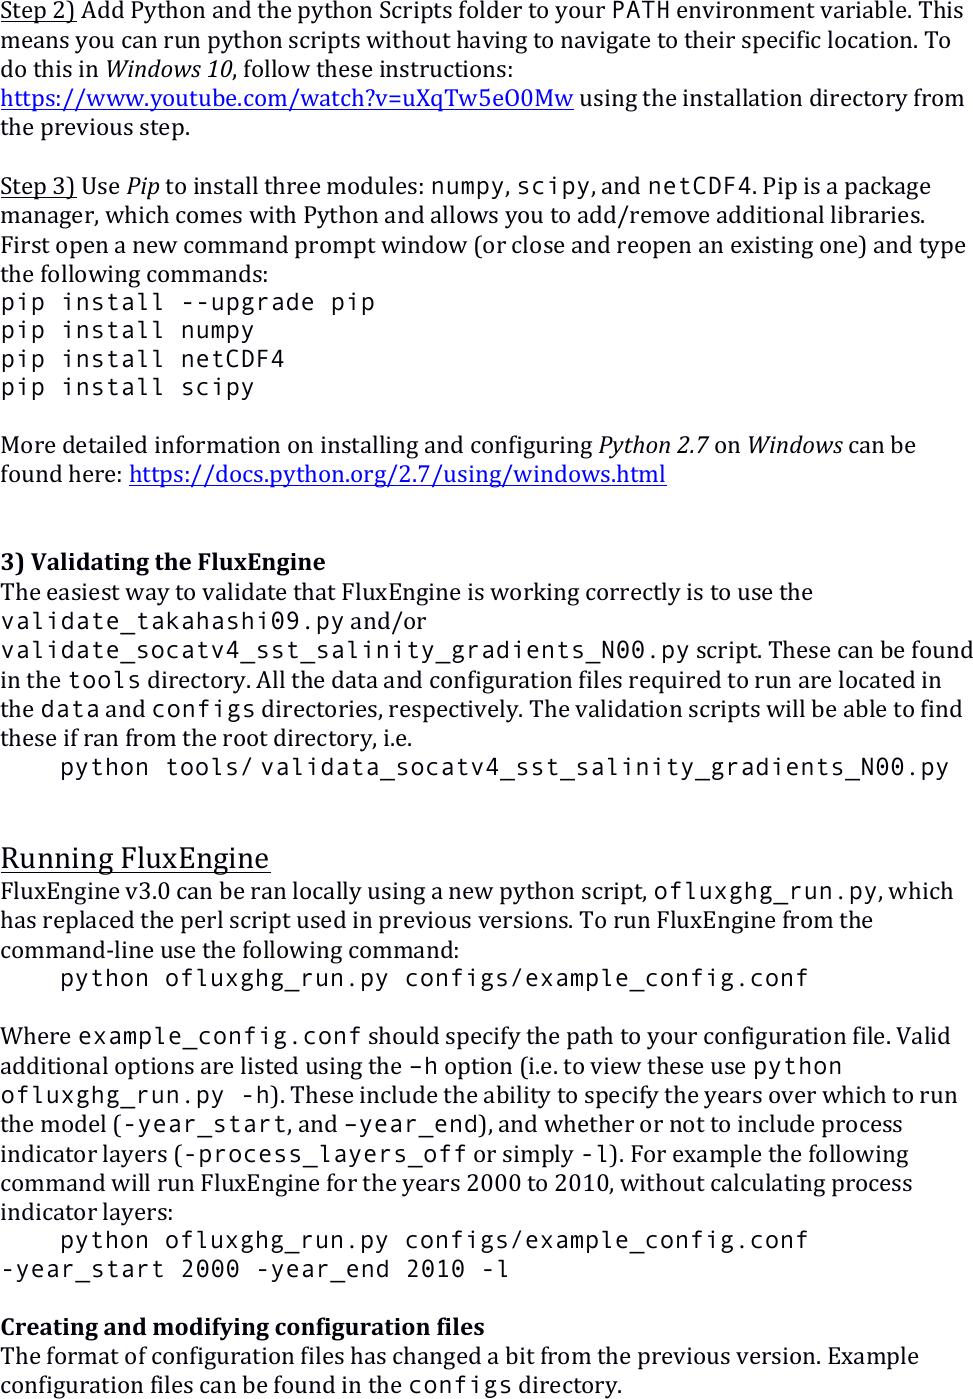 Run Python Script From Command Line